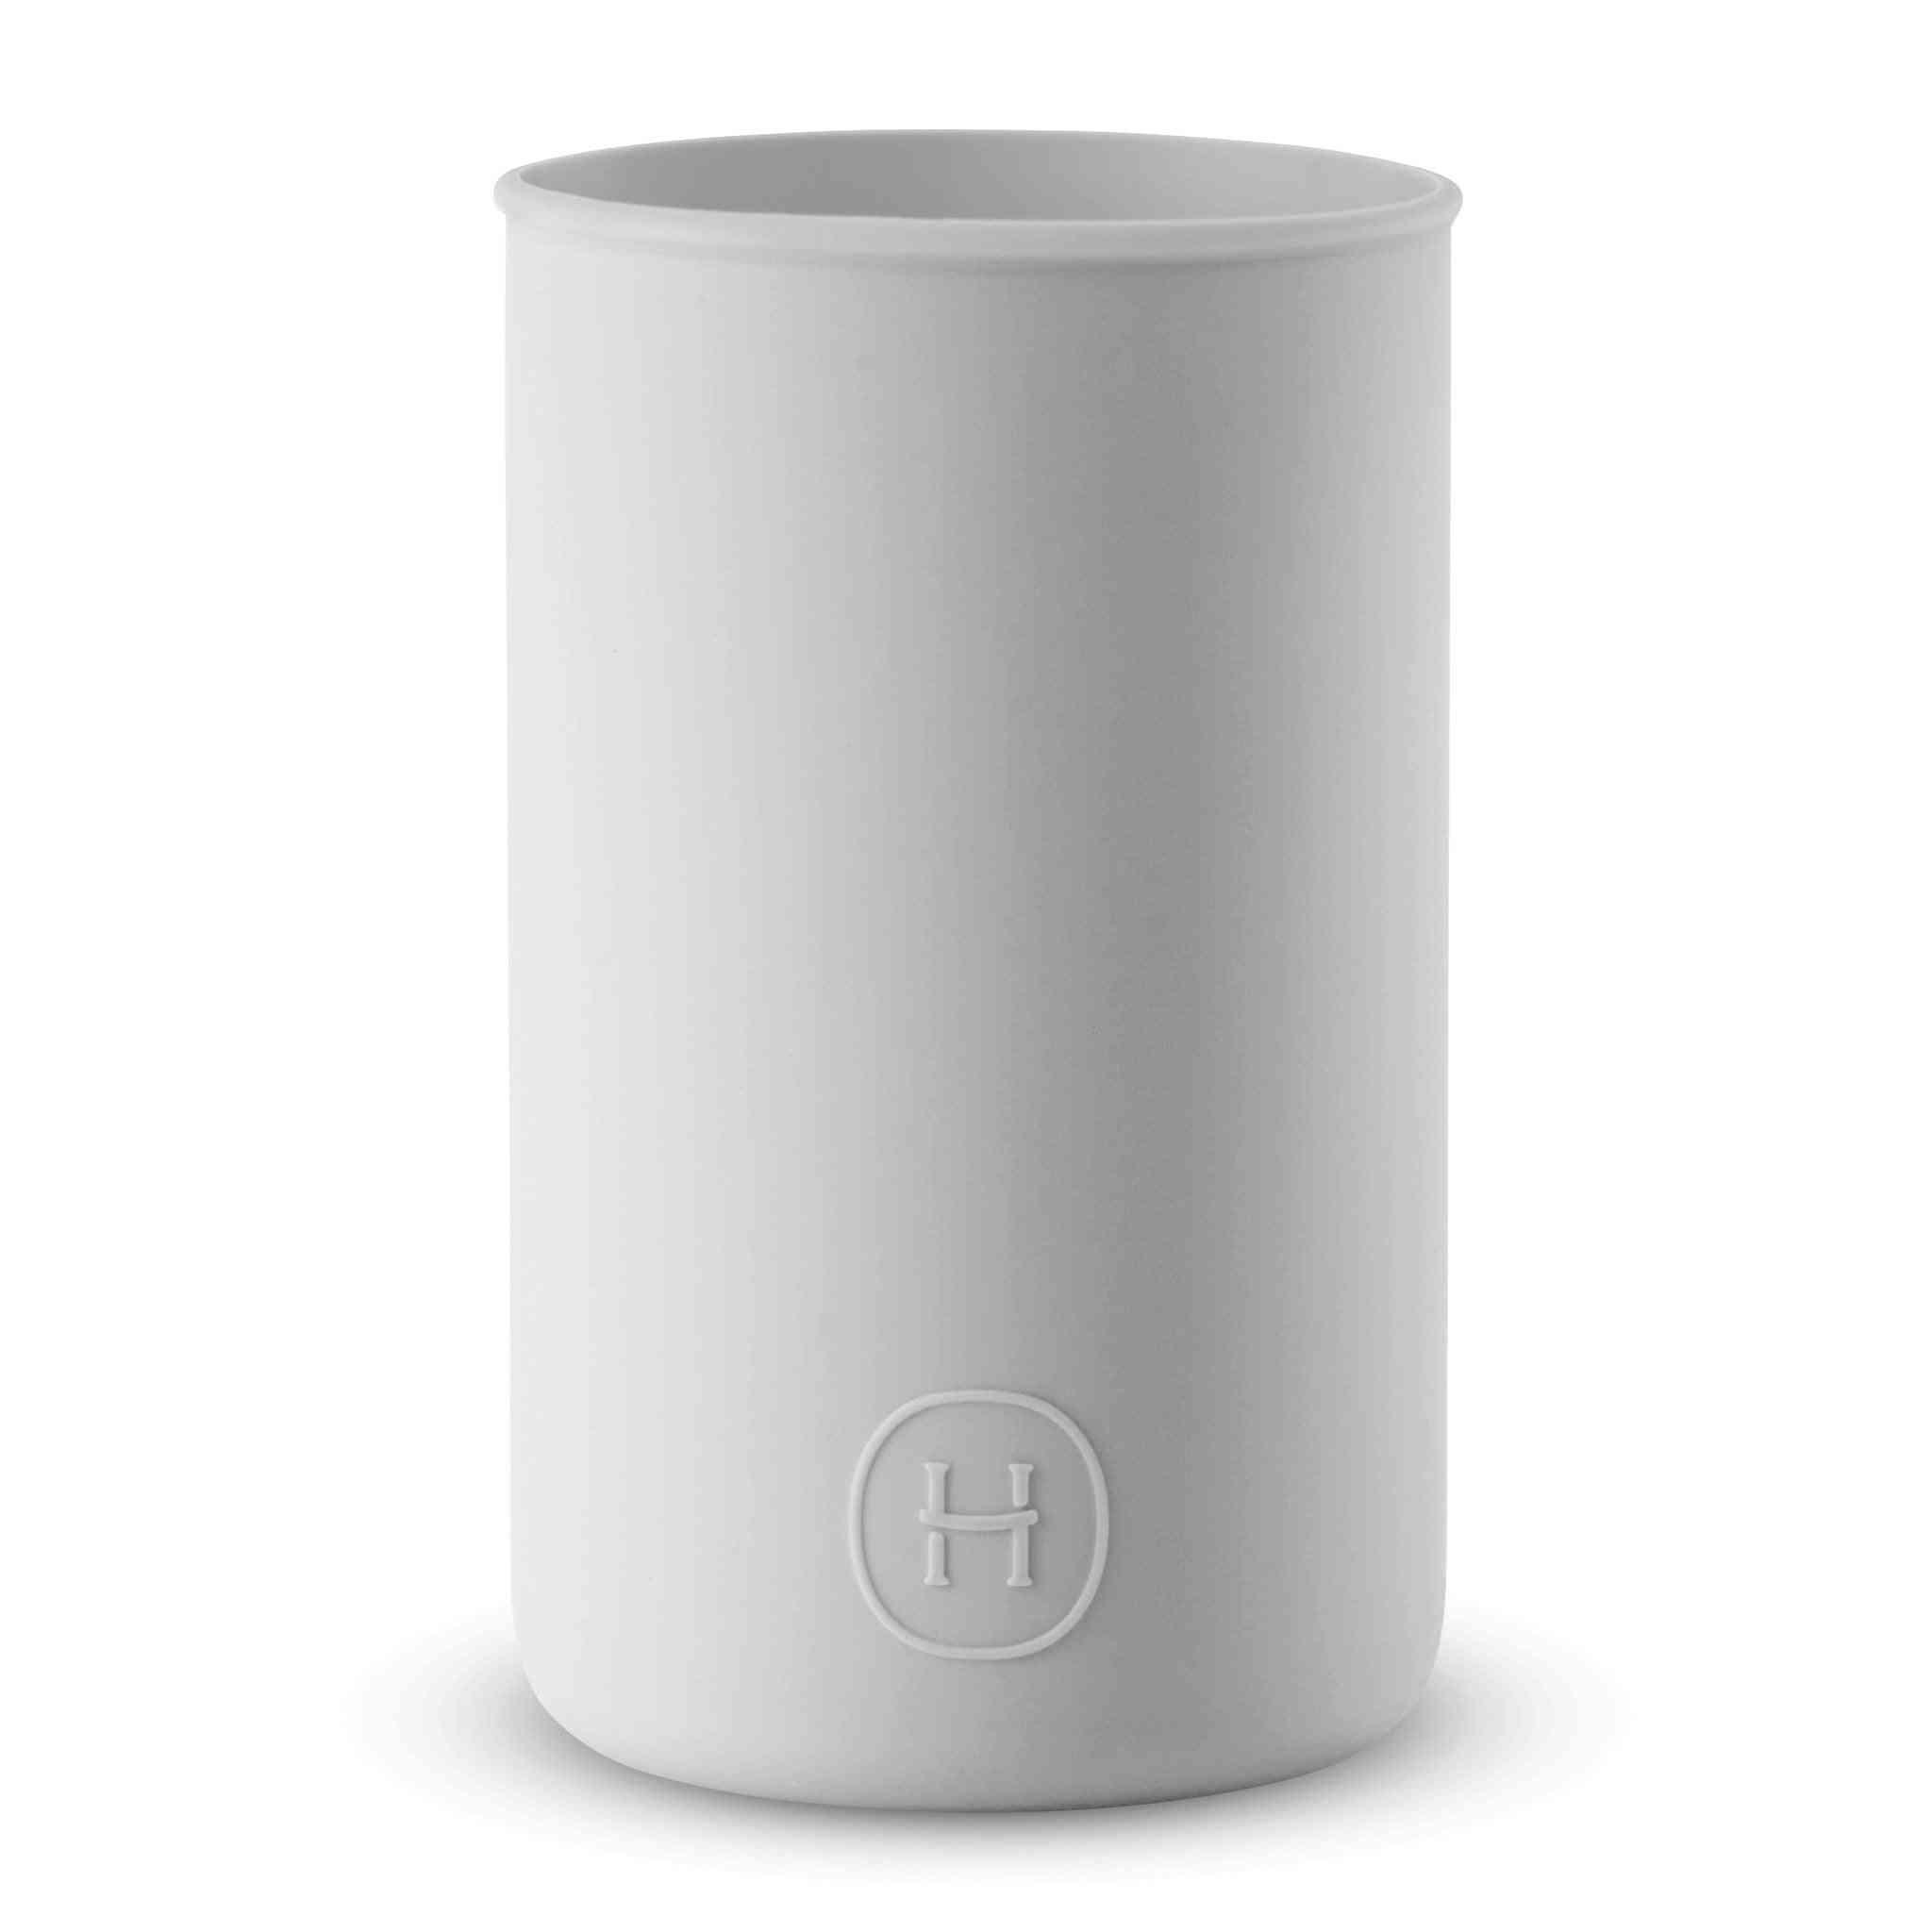 Silicone Sleeve Drinkware